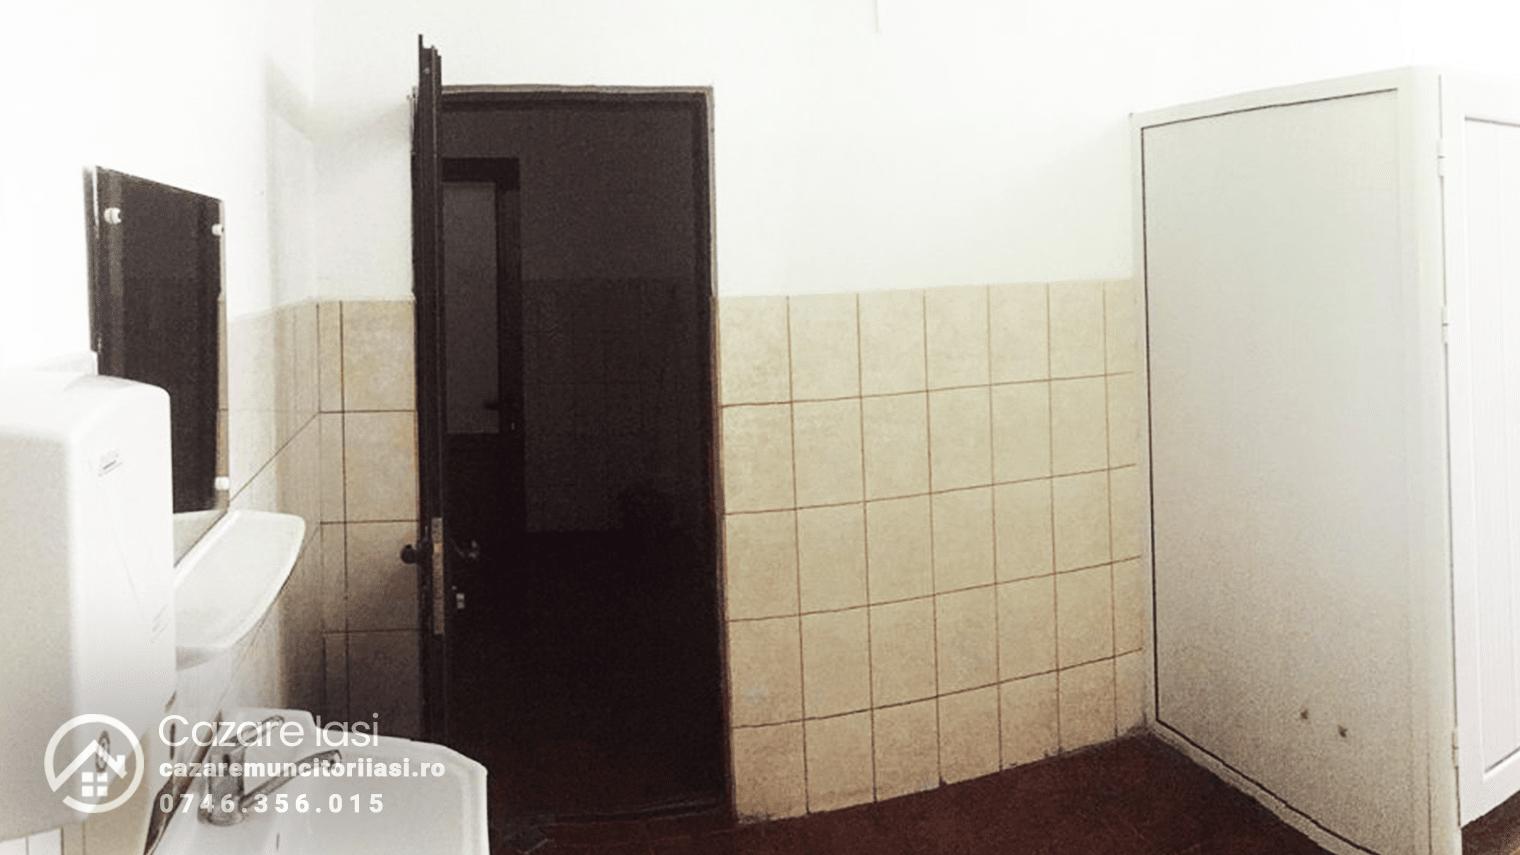 baie locatie hostel Iasi 2x